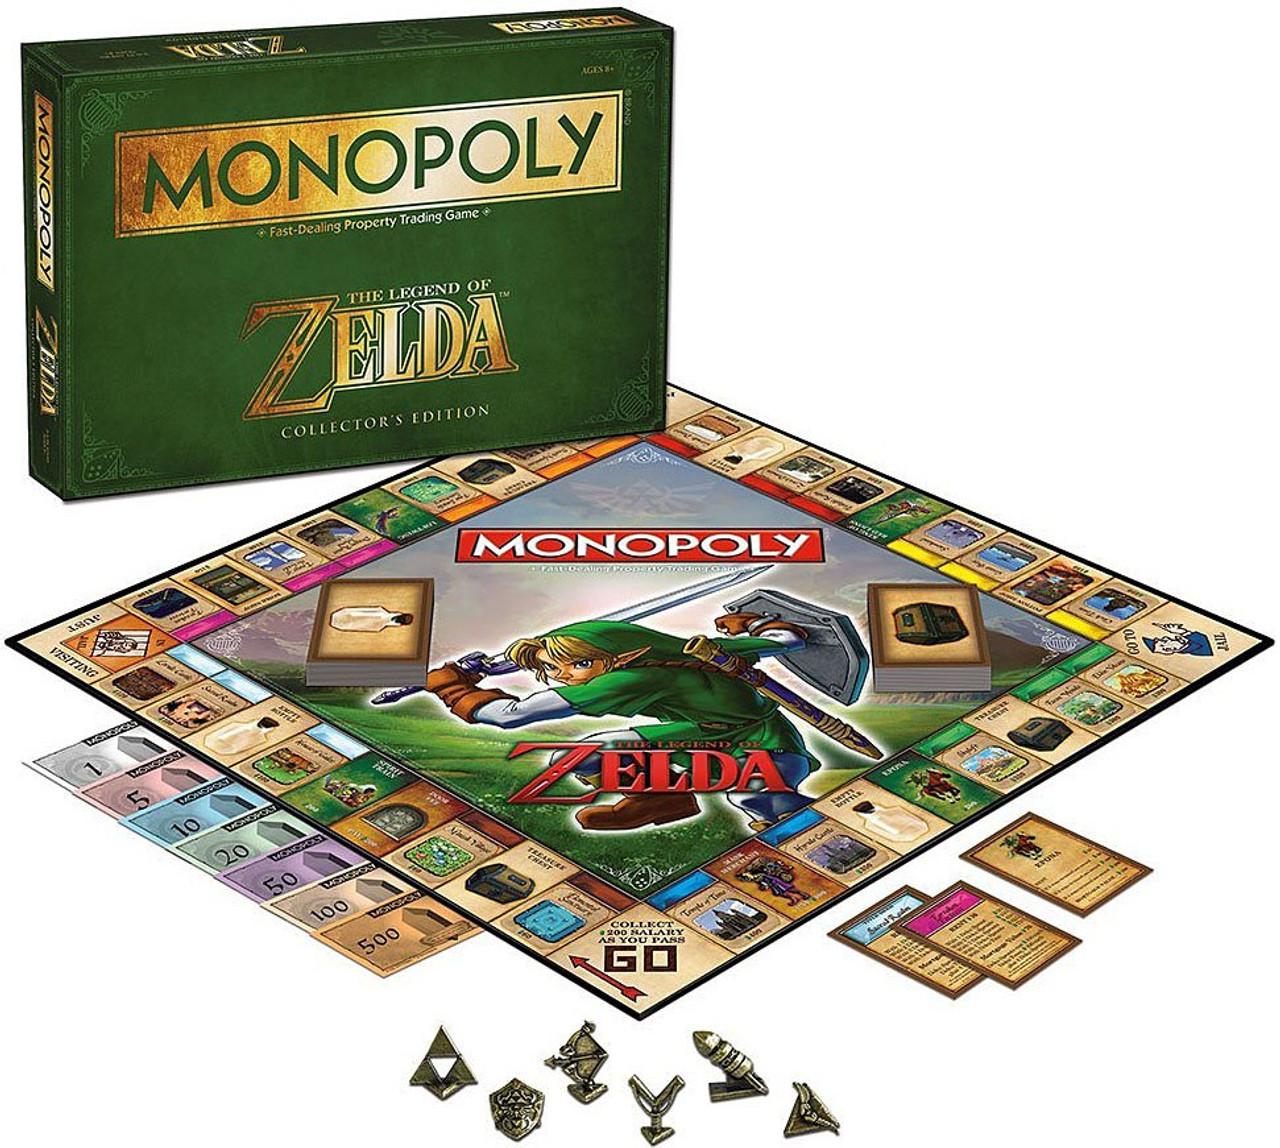 The Legend of Zelda Monopoly Board Game